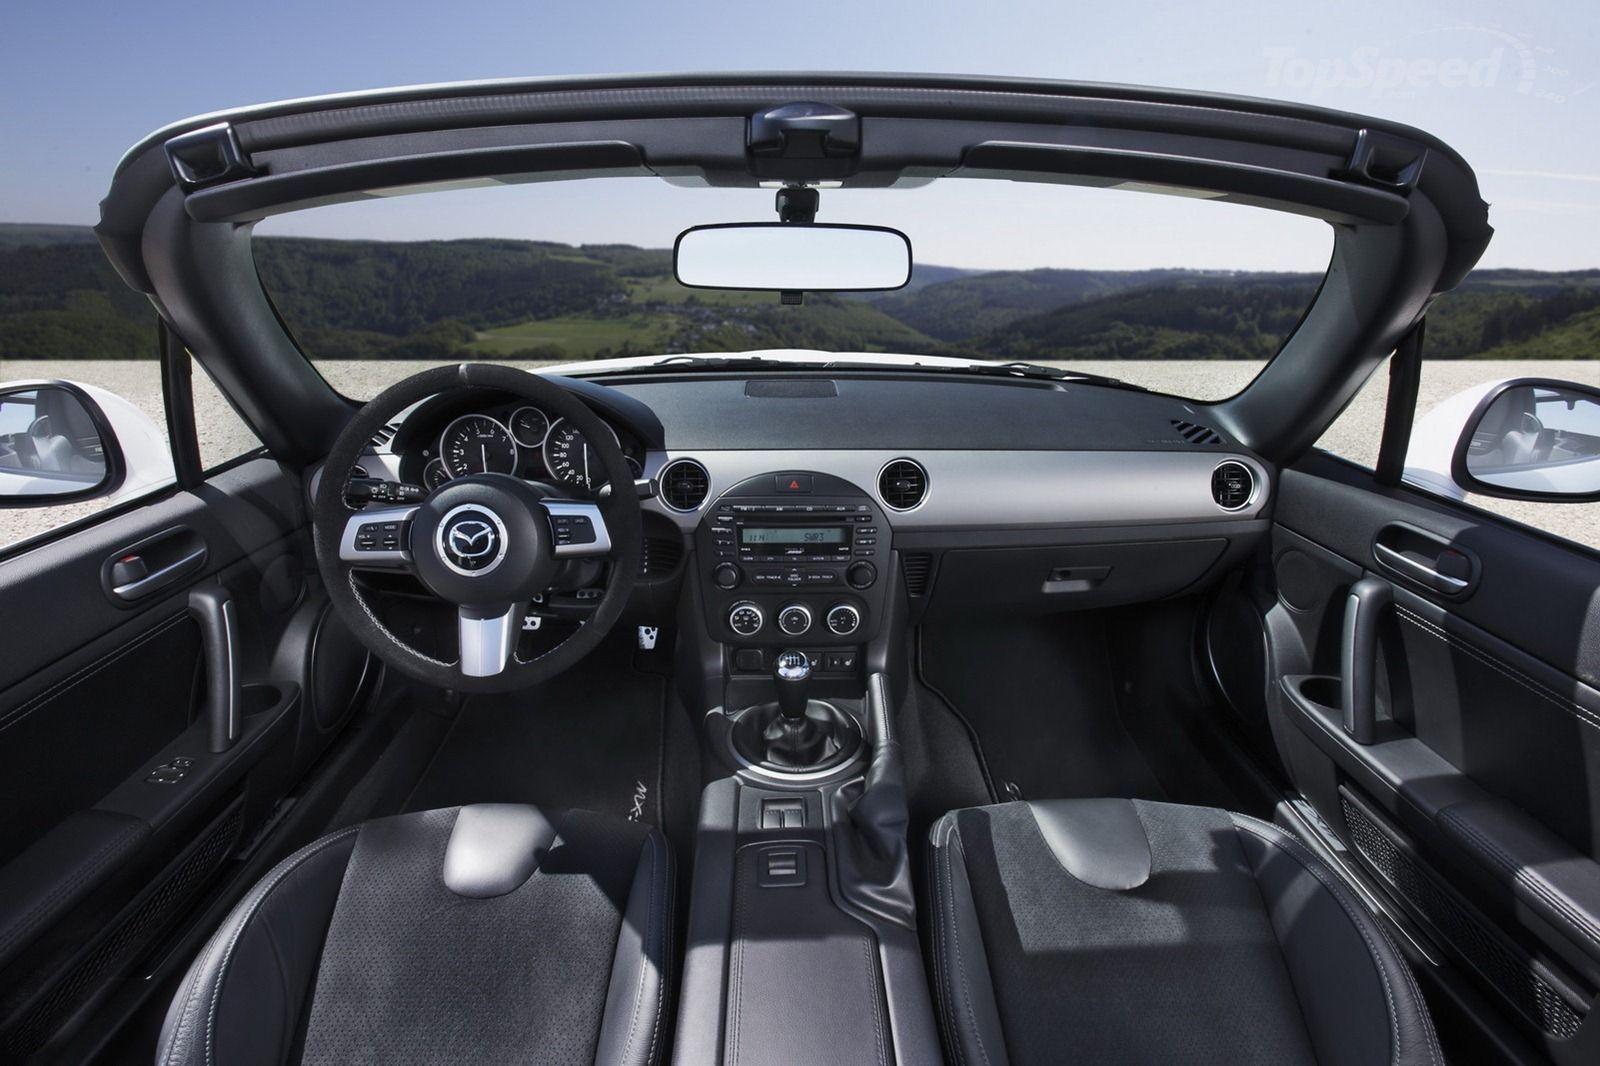 http://3.bp.blogspot.com/-1GnTlImUoqo/T_A35X1PvSI/AAAAAAAAMF0/J2Tafp_ieD0/s1600/Mazda+MX-5+GT+Concept+%282012%293.jpg